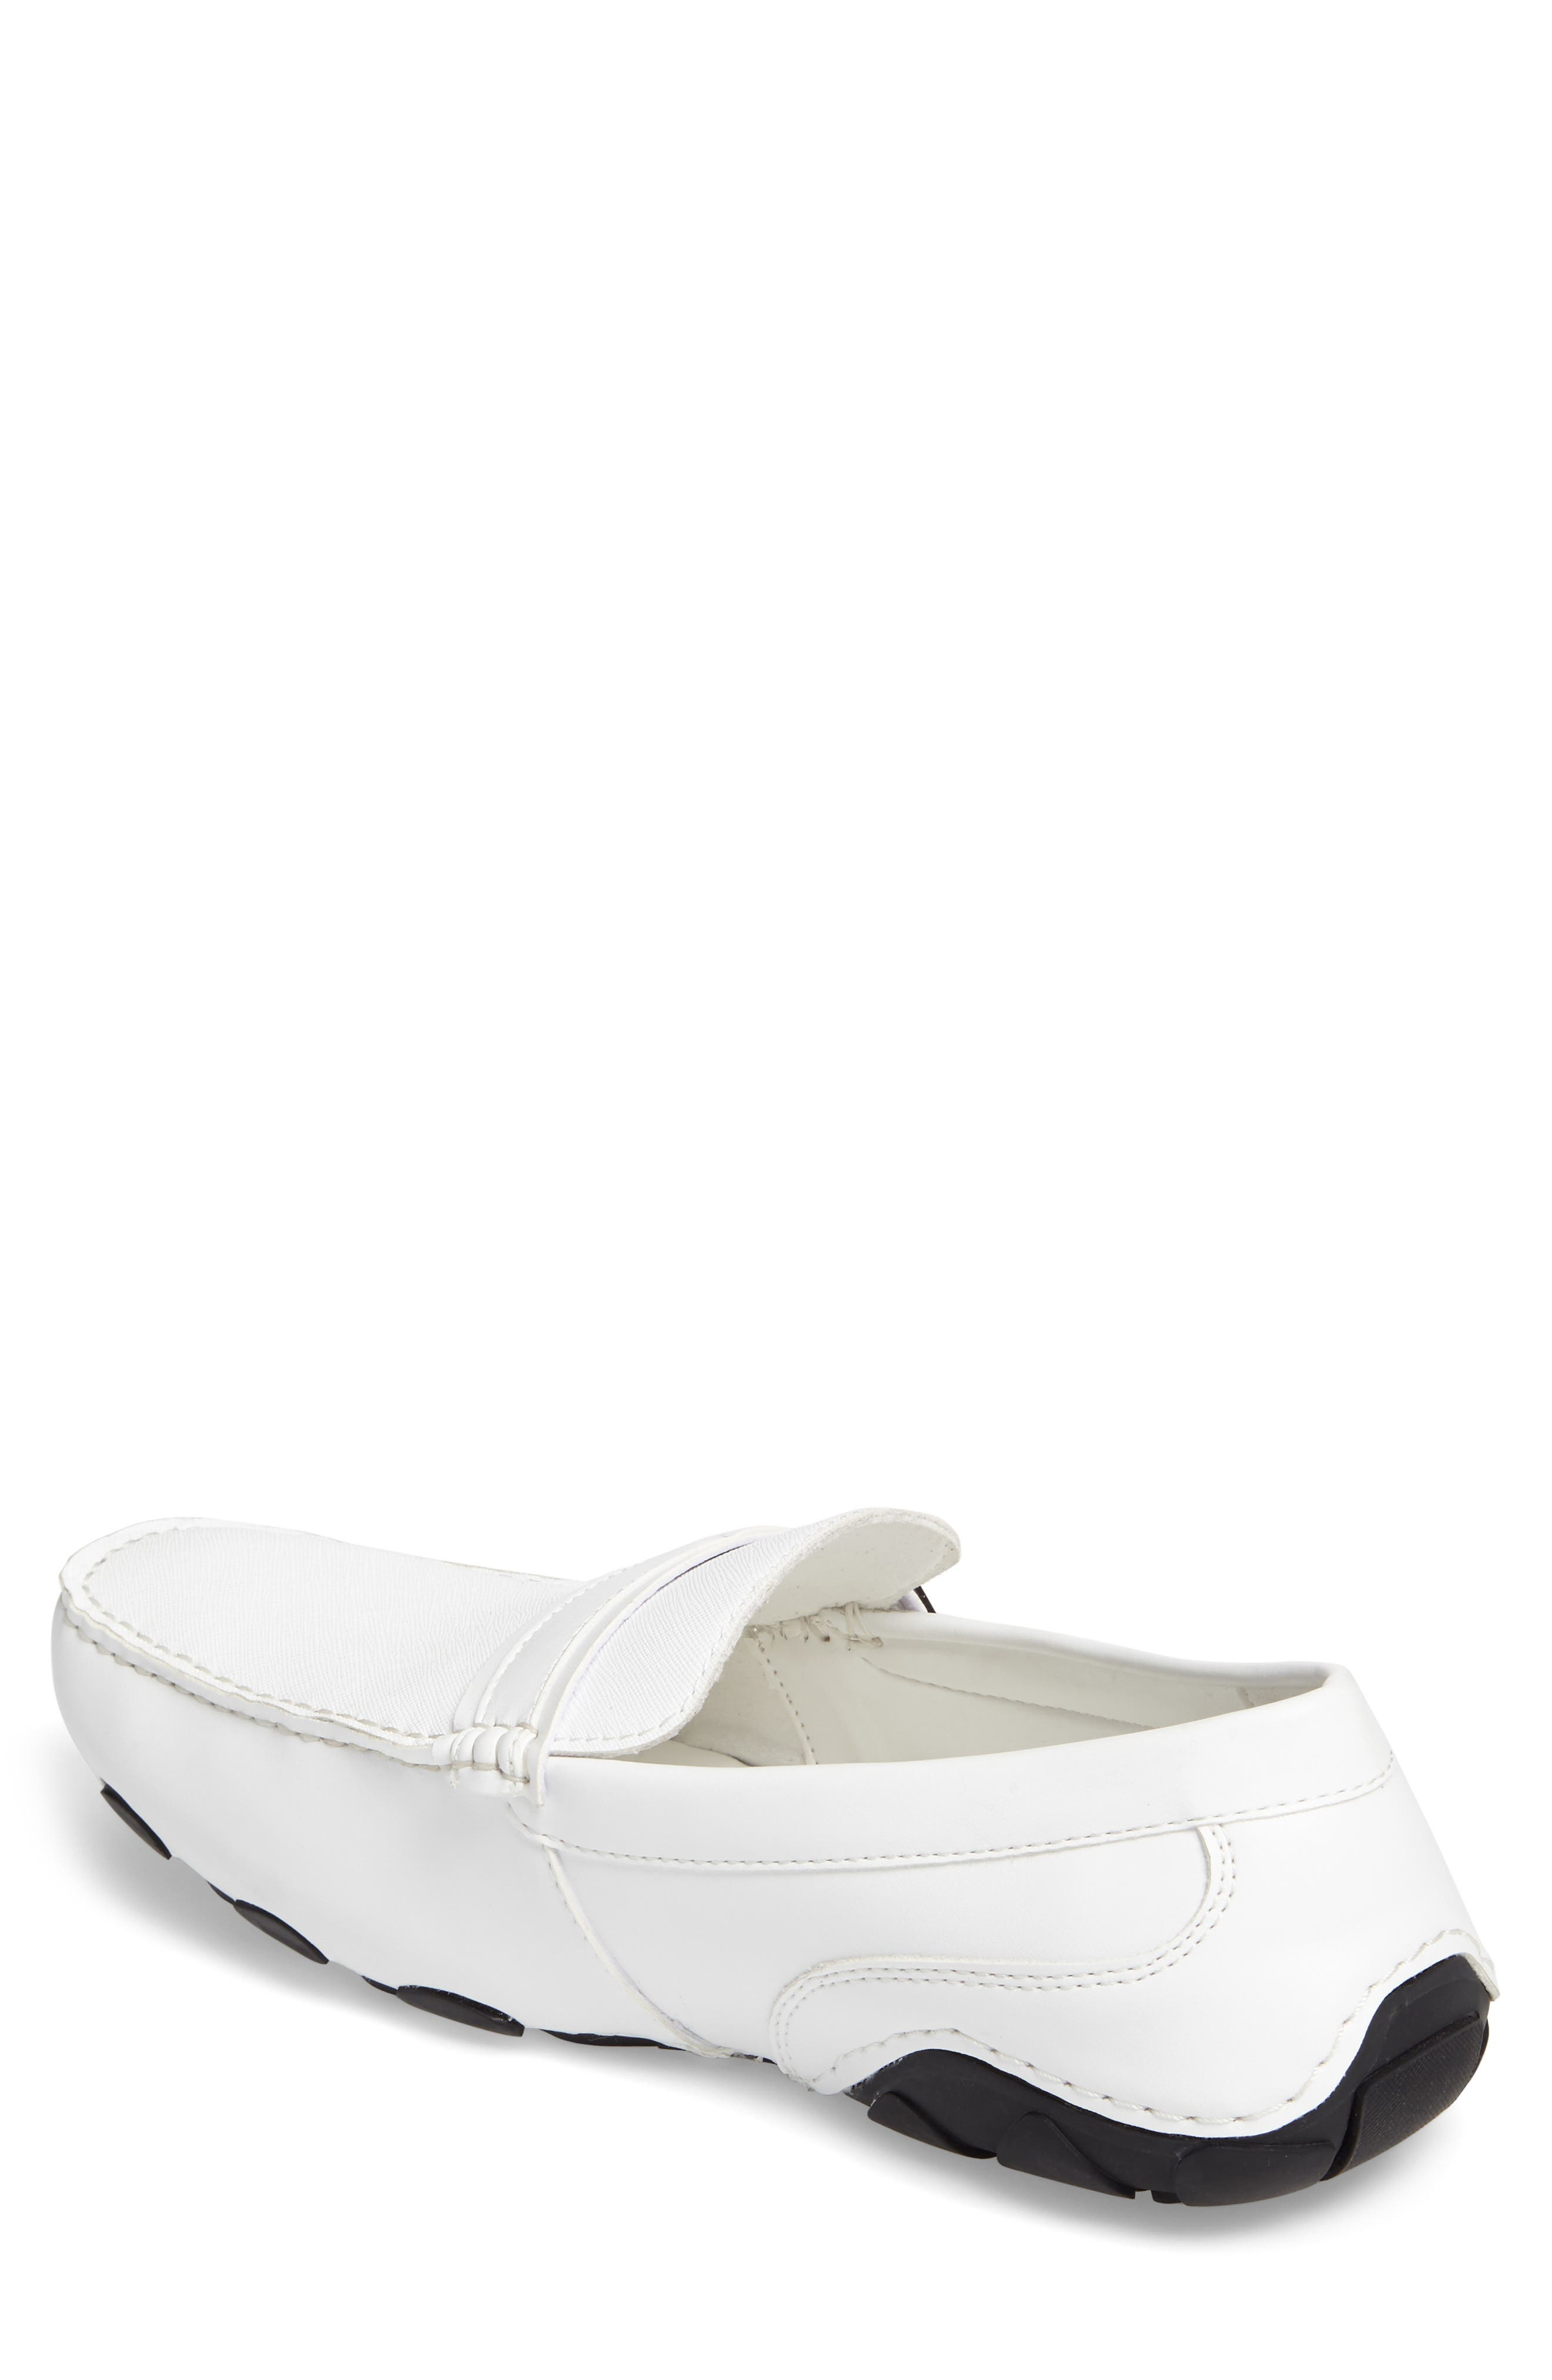 'Toast 2 Me' Driving Shoe,                             Alternate thumbnail 2, color,                             White Leather